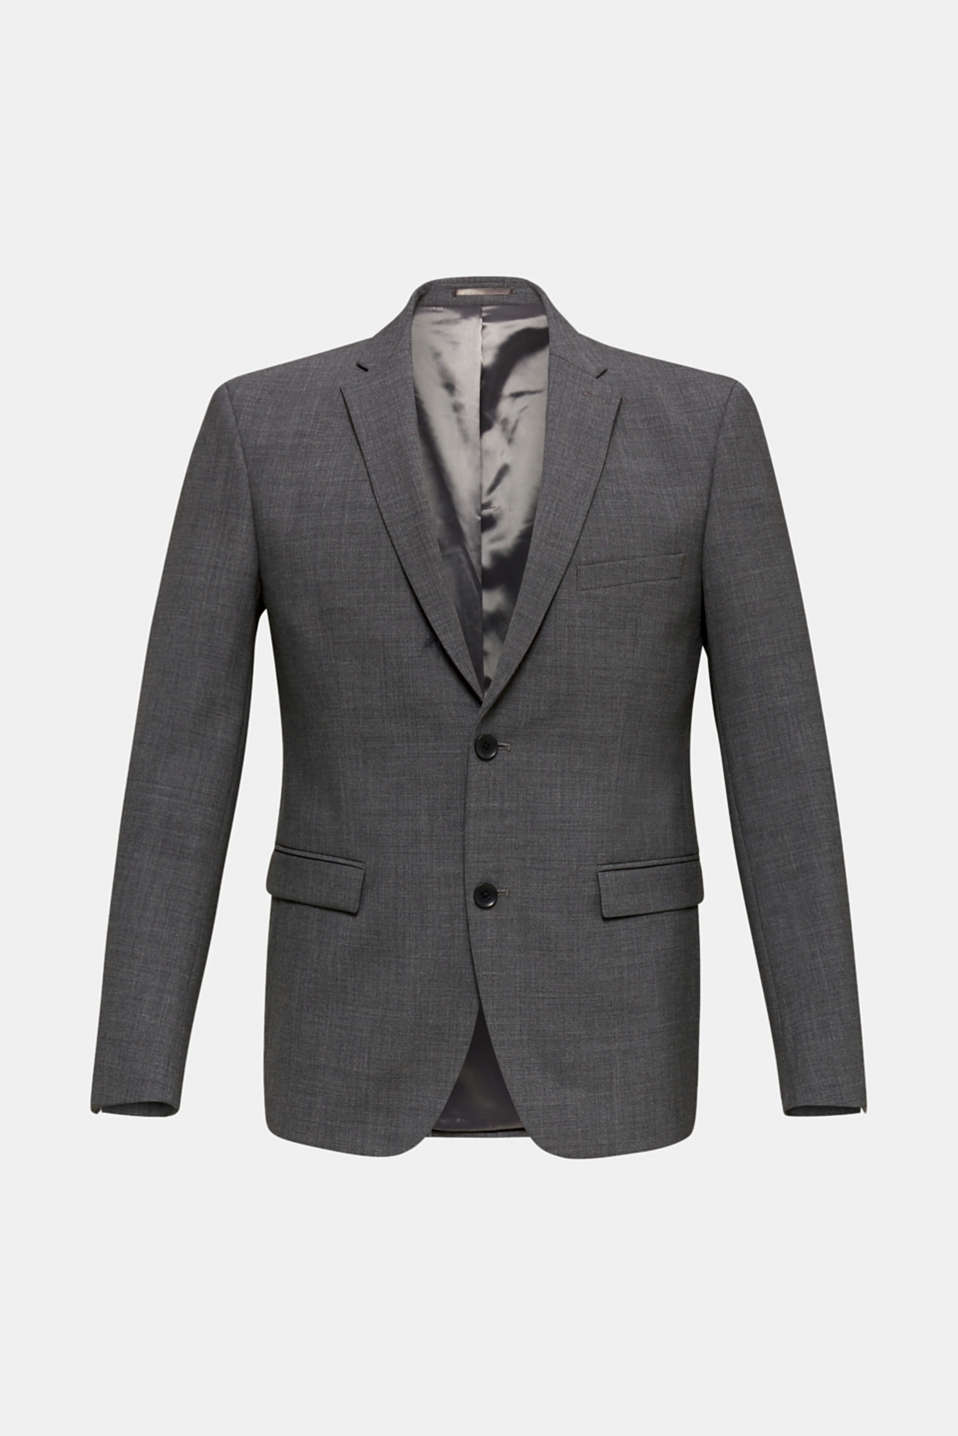 ACTIVE SUIT tailored jacket, wool blend, DARK GREY 5, detail image number 7